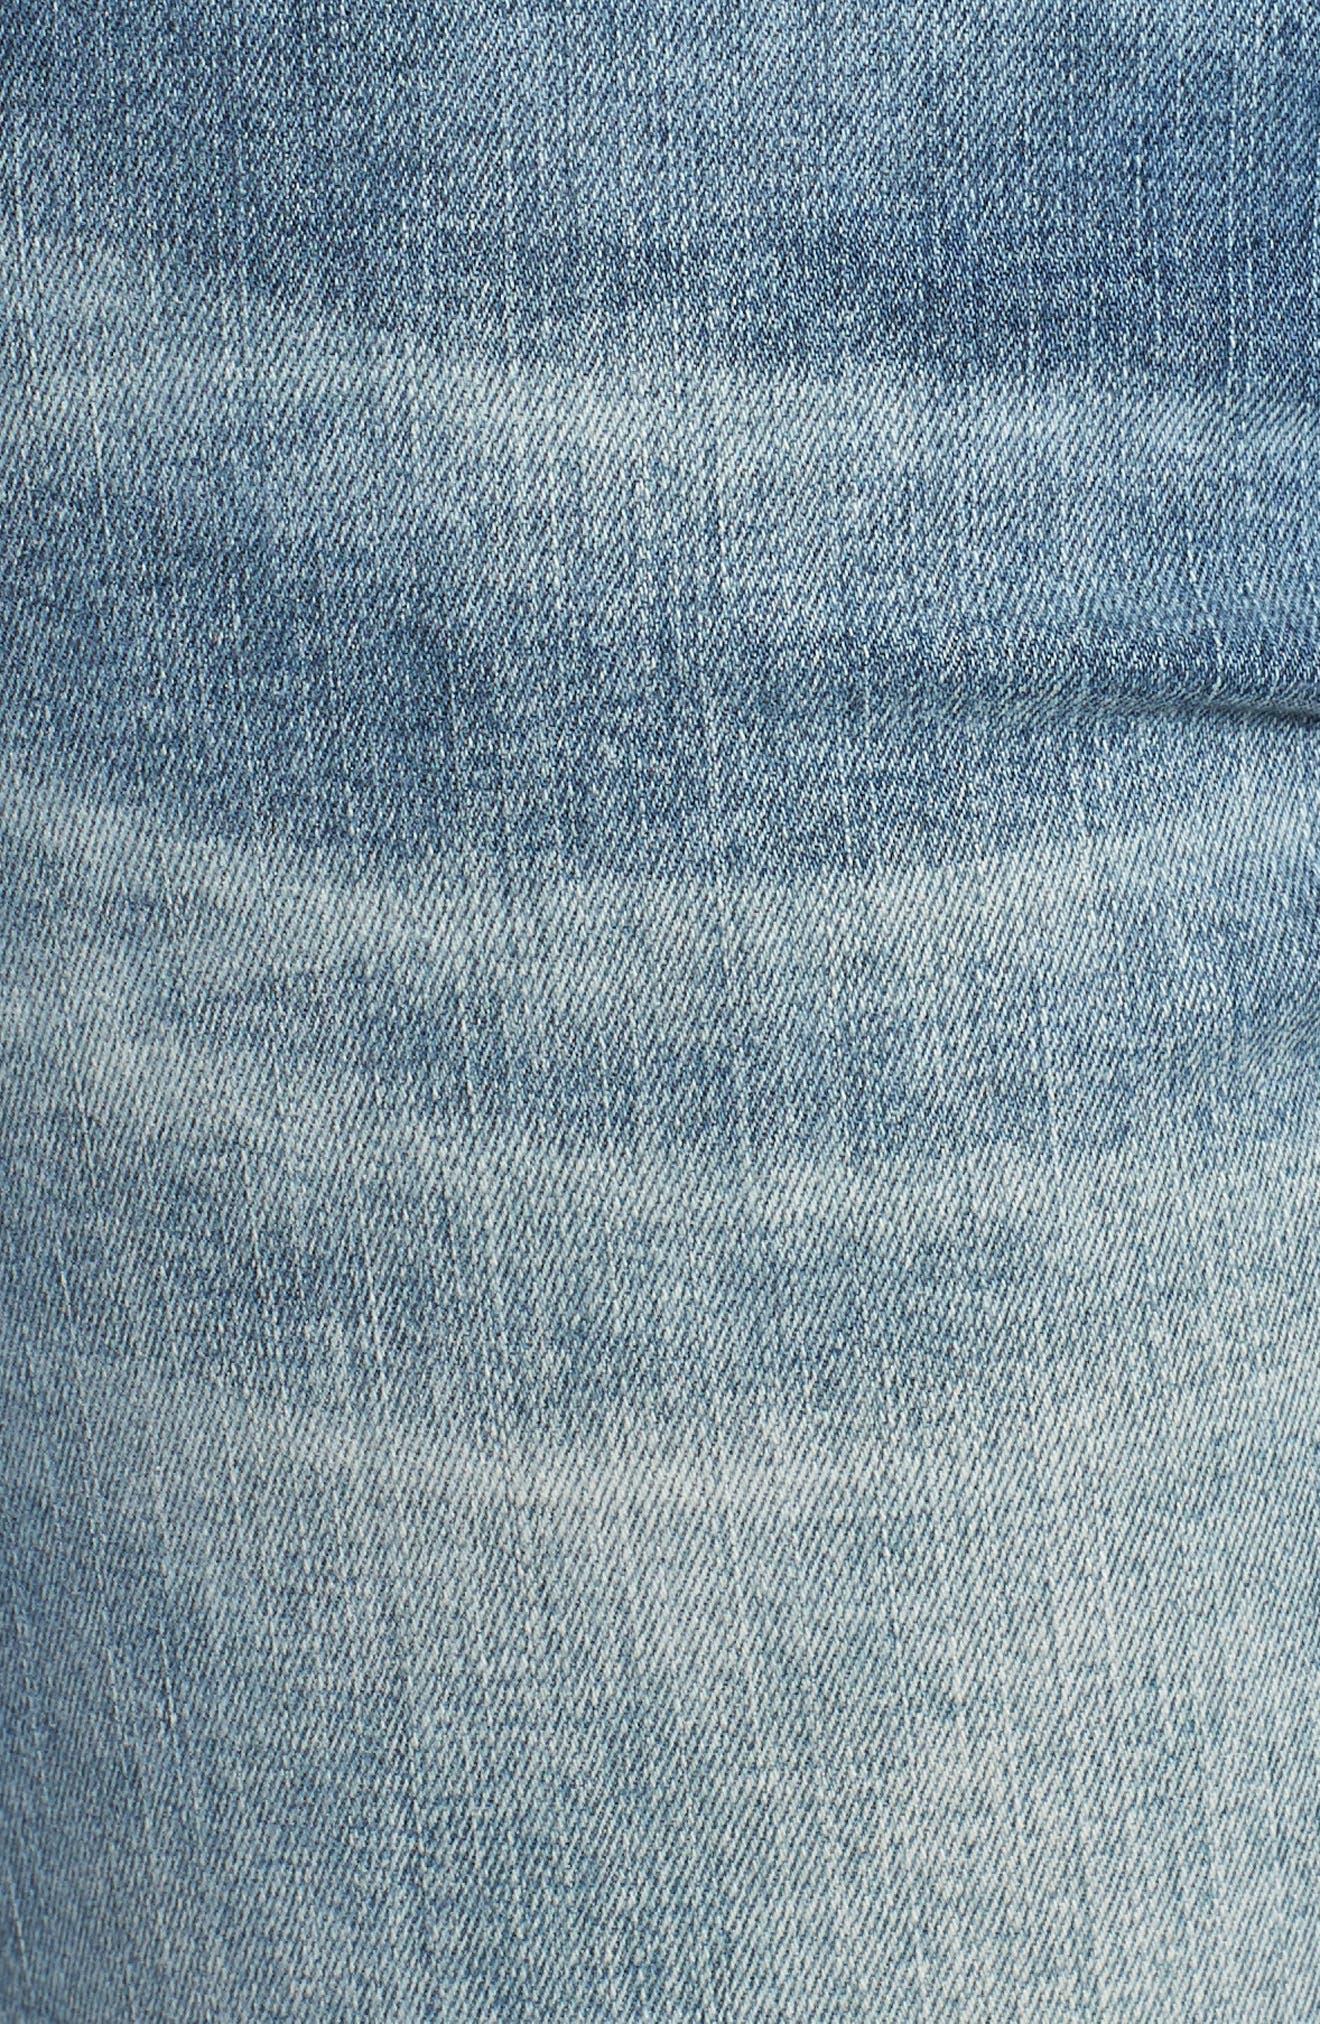 Alissa Ankle Jeans,                             Alternate thumbnail 6, color,                             Random Nolita